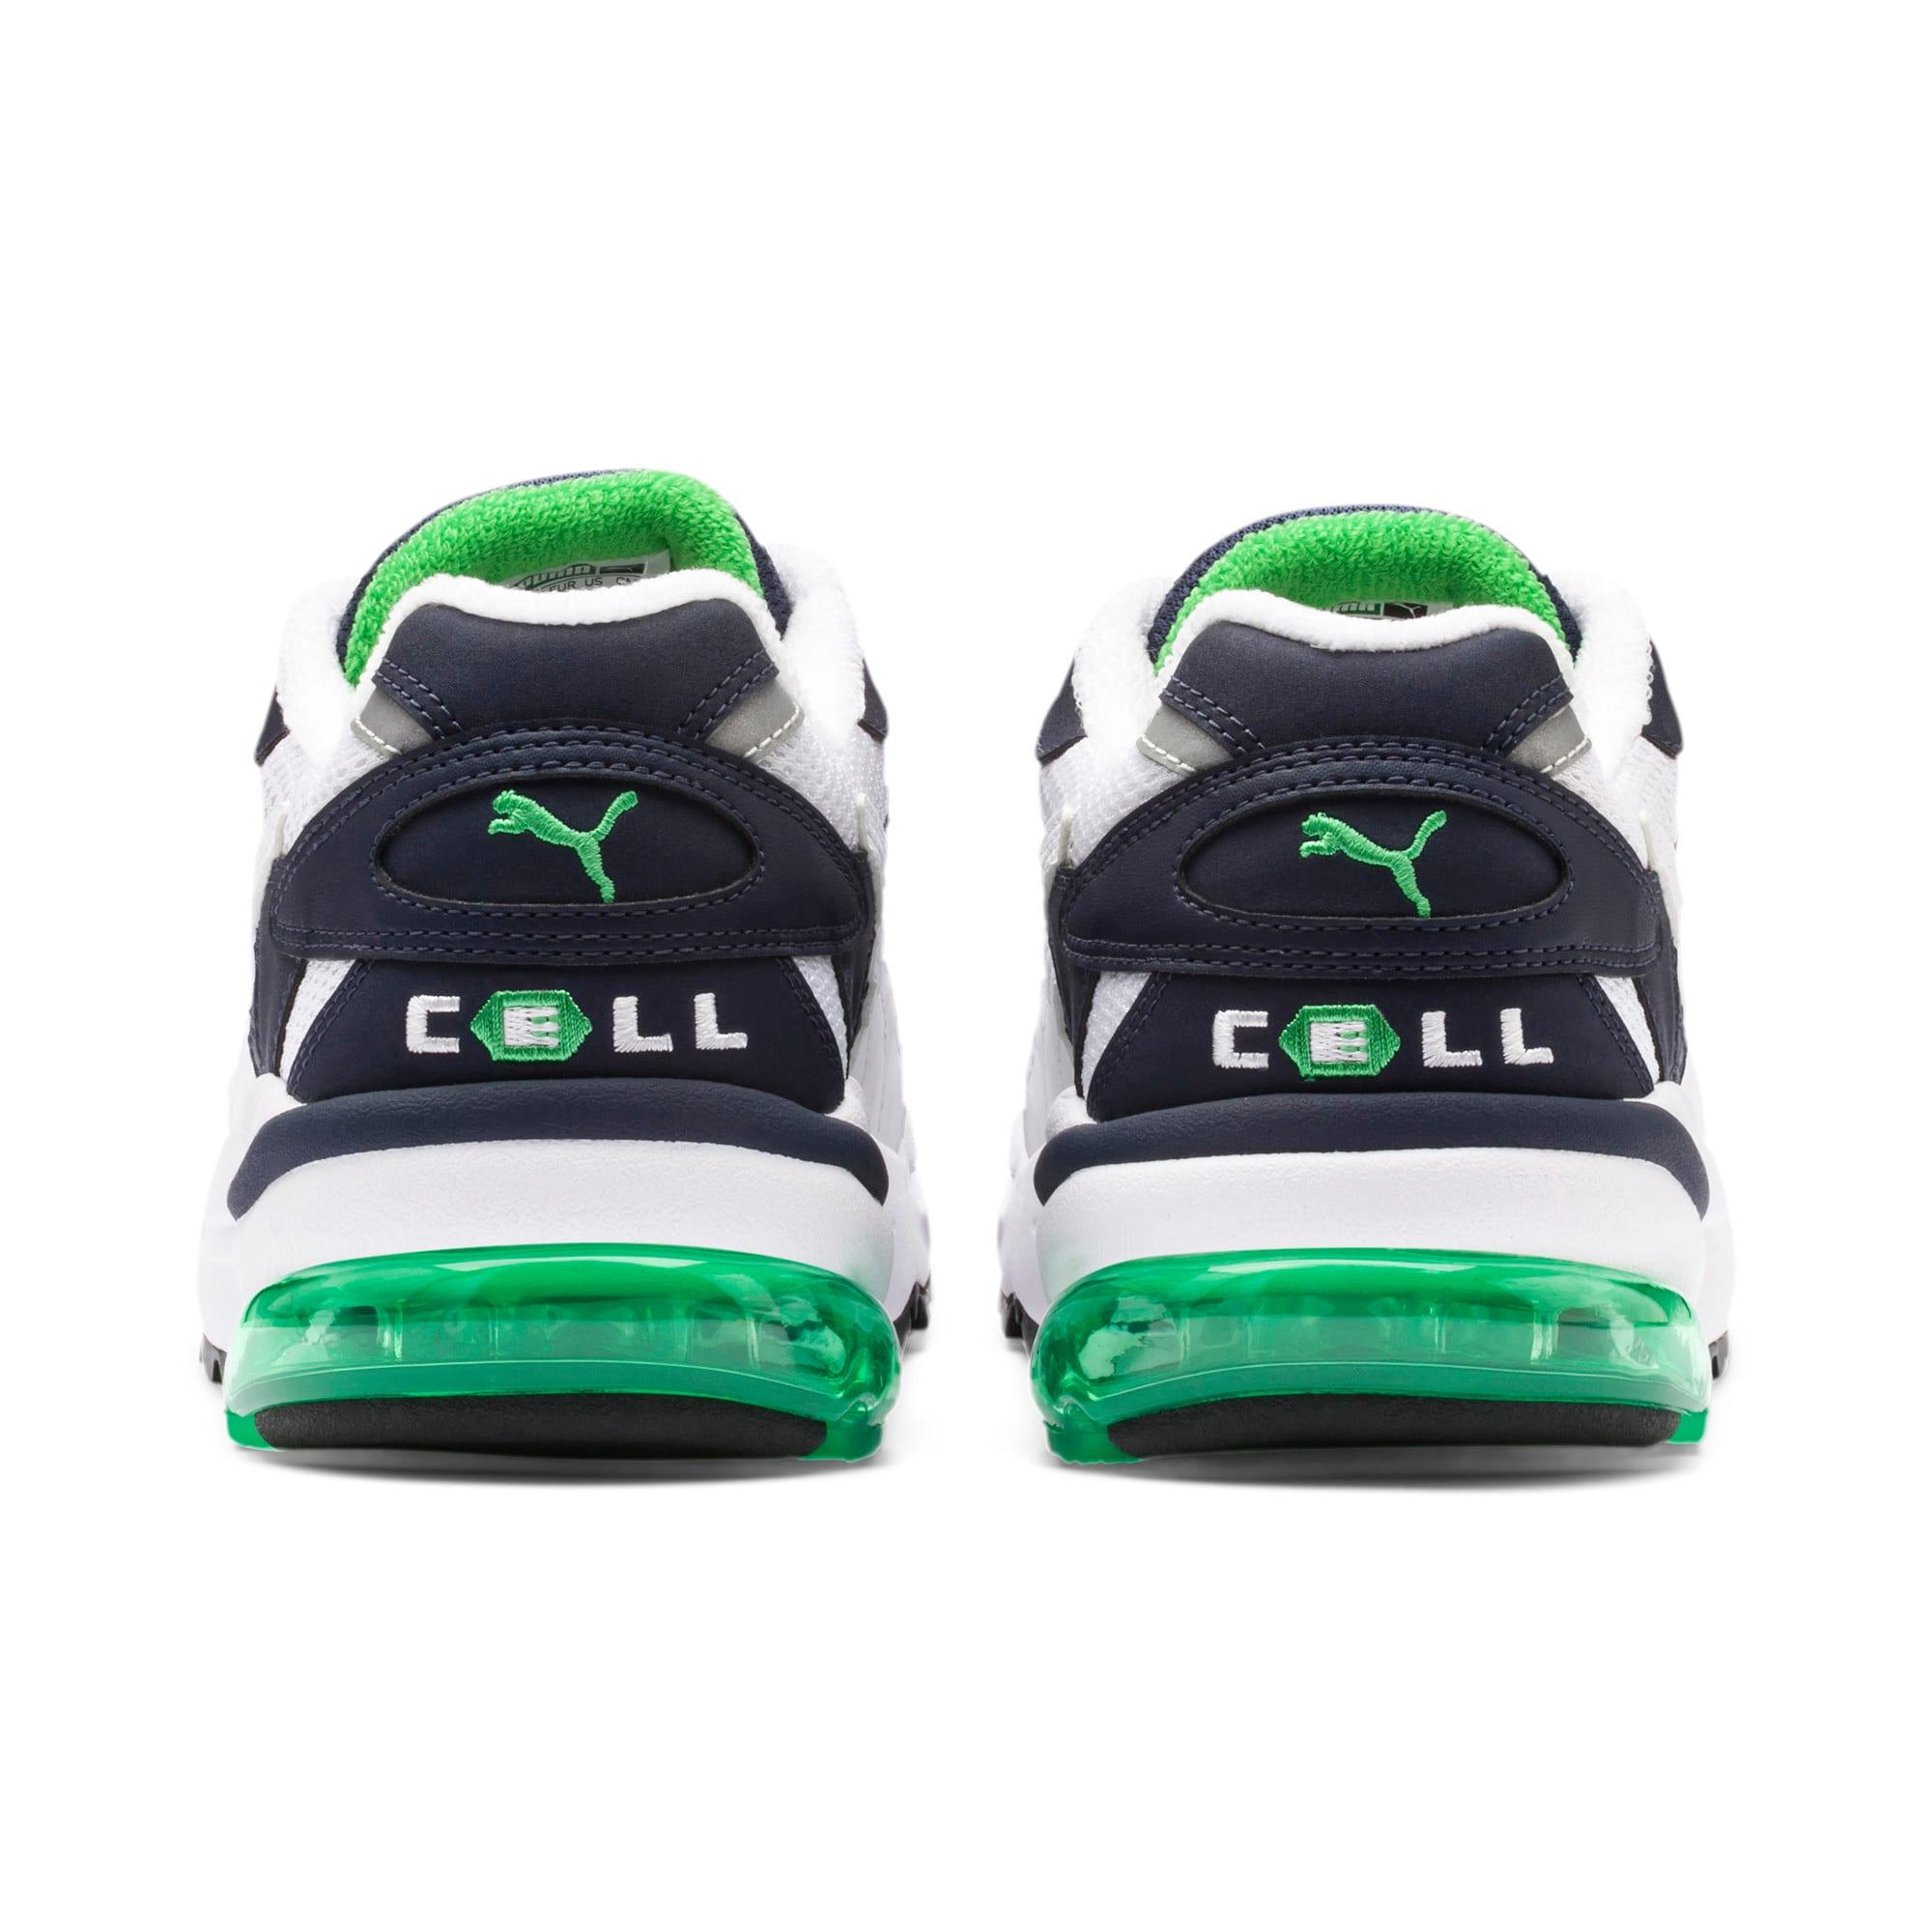 Thumbnail 4 of CELL Alien OG Trainers, Peacoat-Classic Green, medium